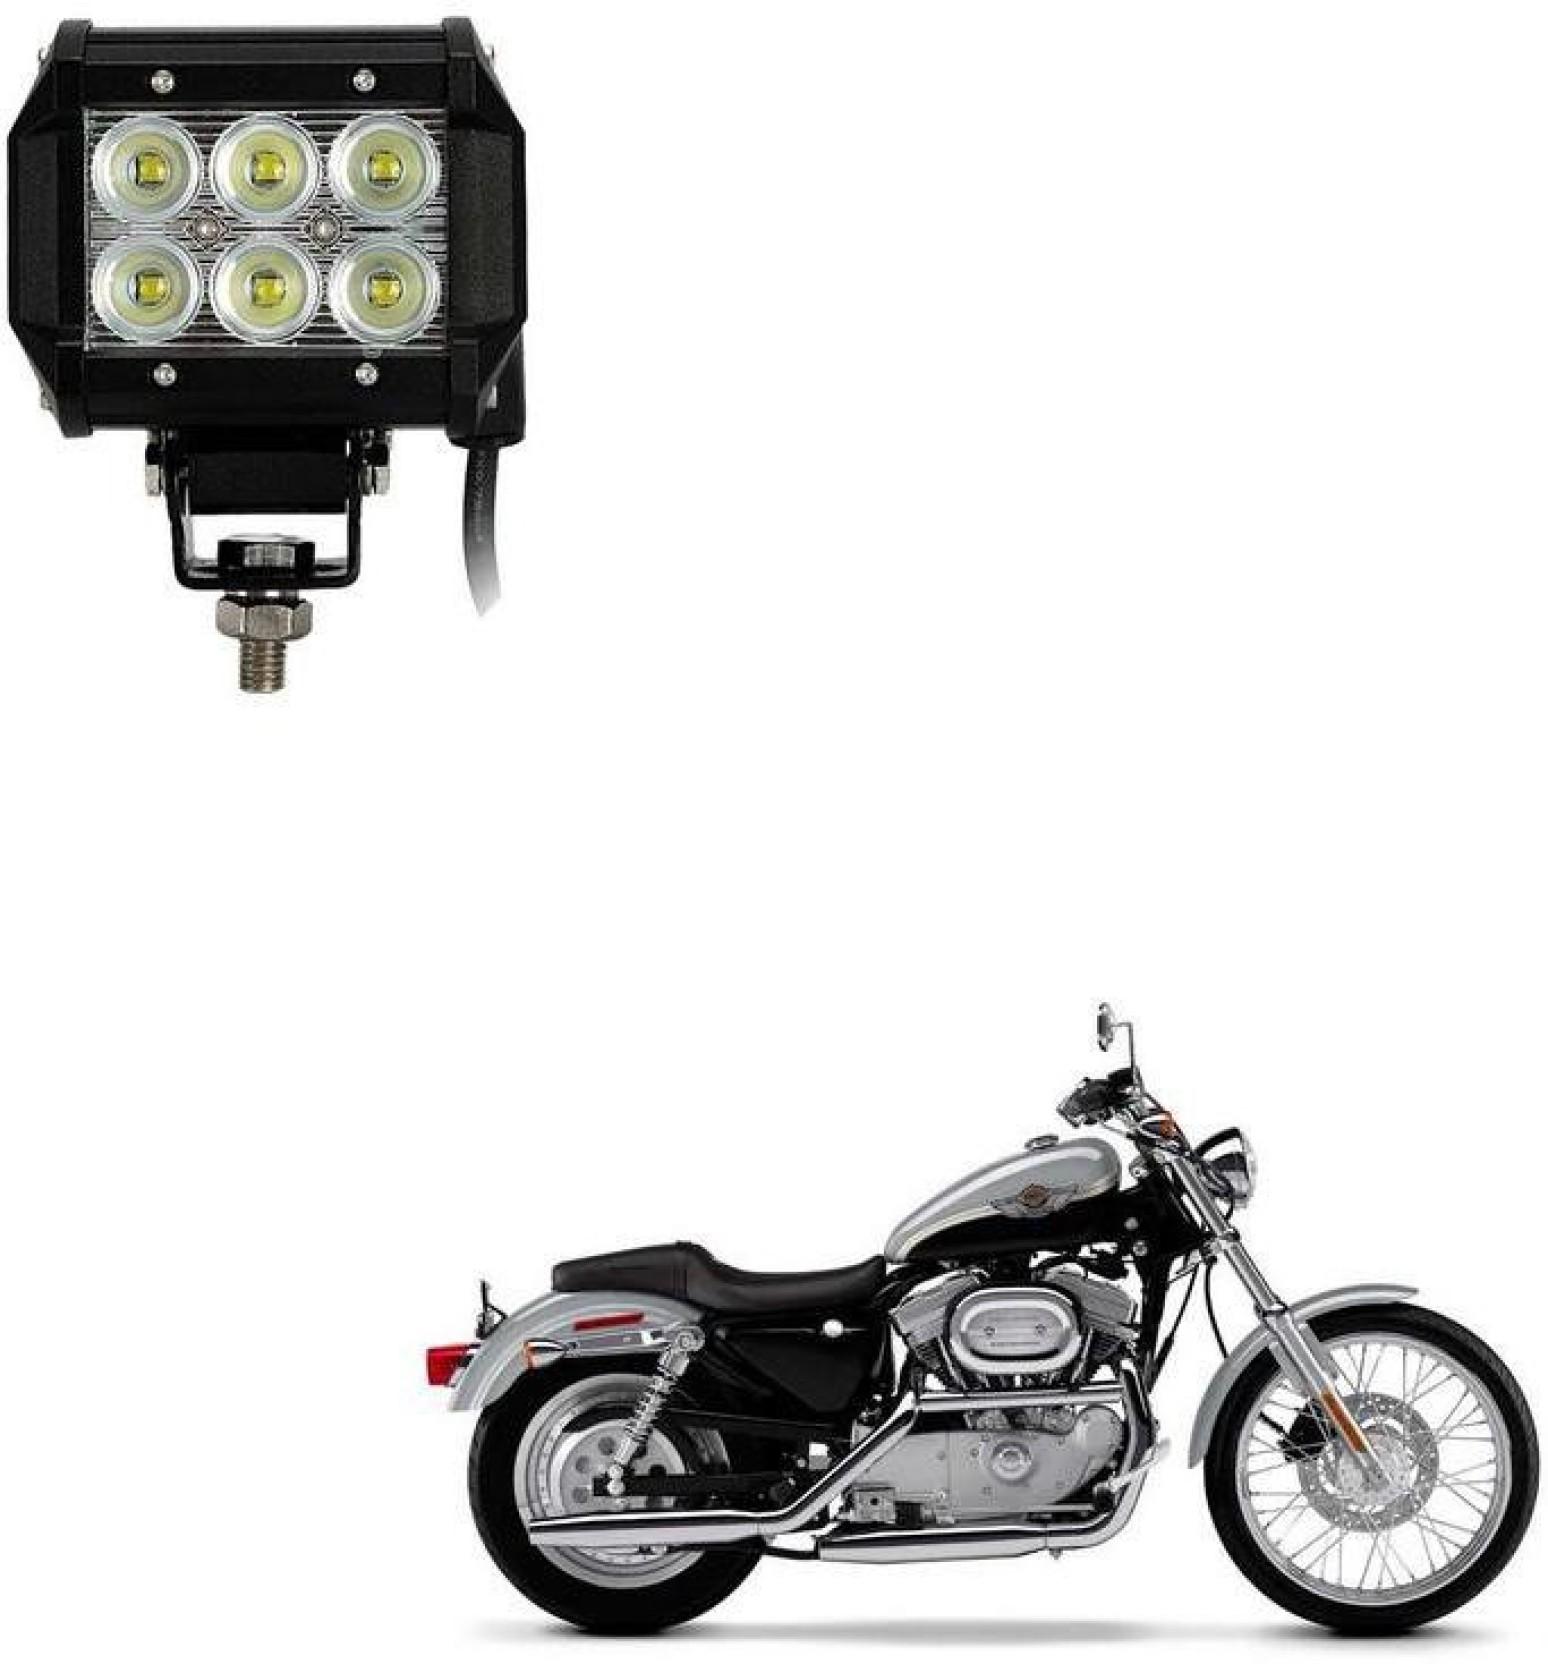 AutoKraftZ HID Fog Light For Harley Davidson Universal For